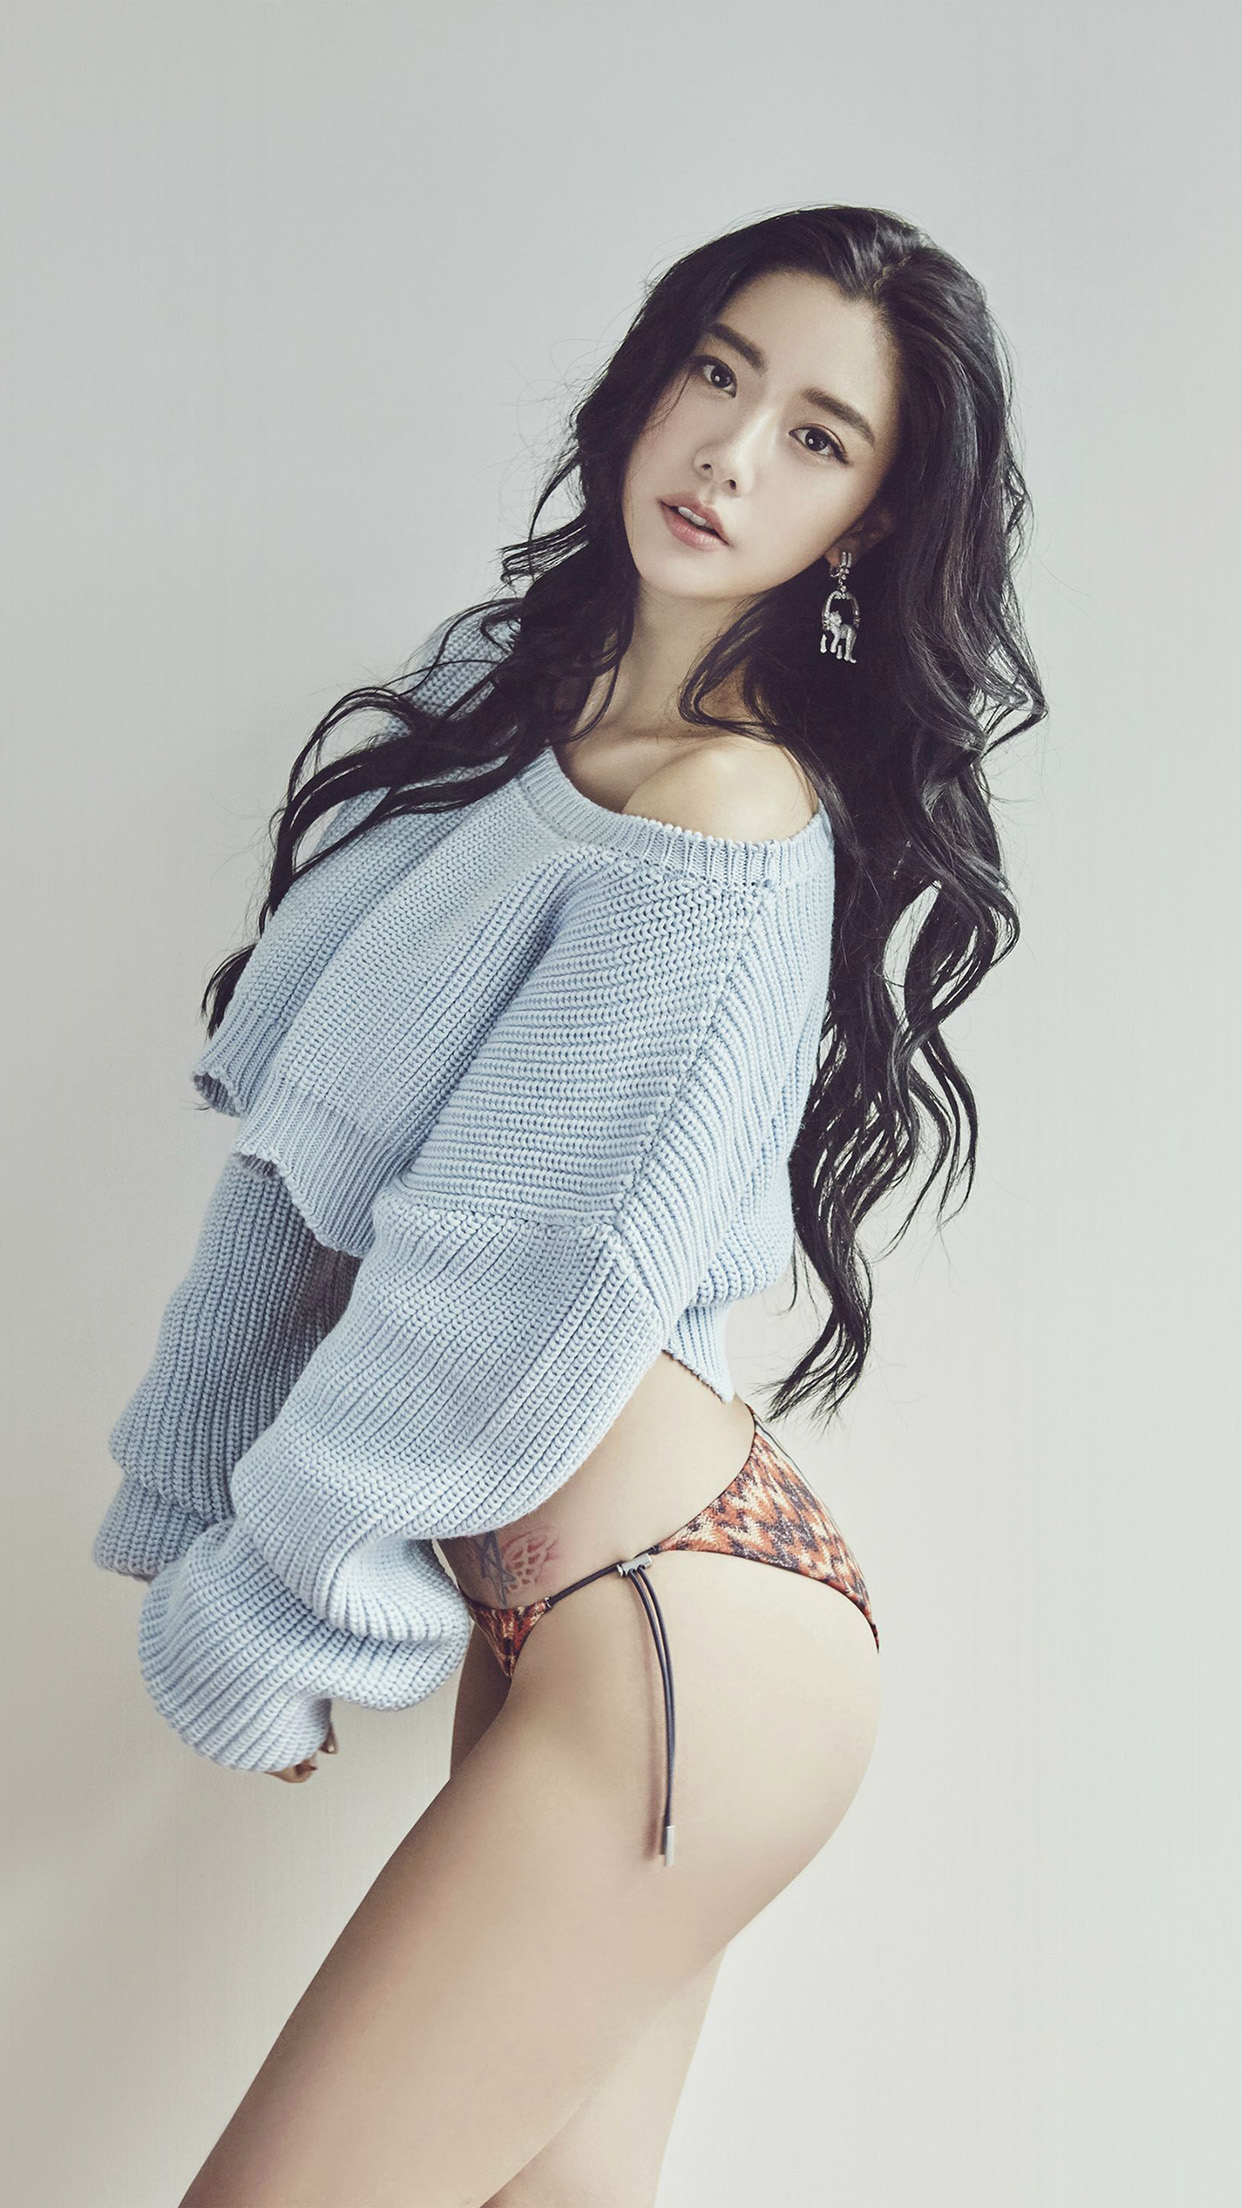 Hq Cute Girl Wallpaper Hq91 Korean Girl Clara Sexy Wallpaper